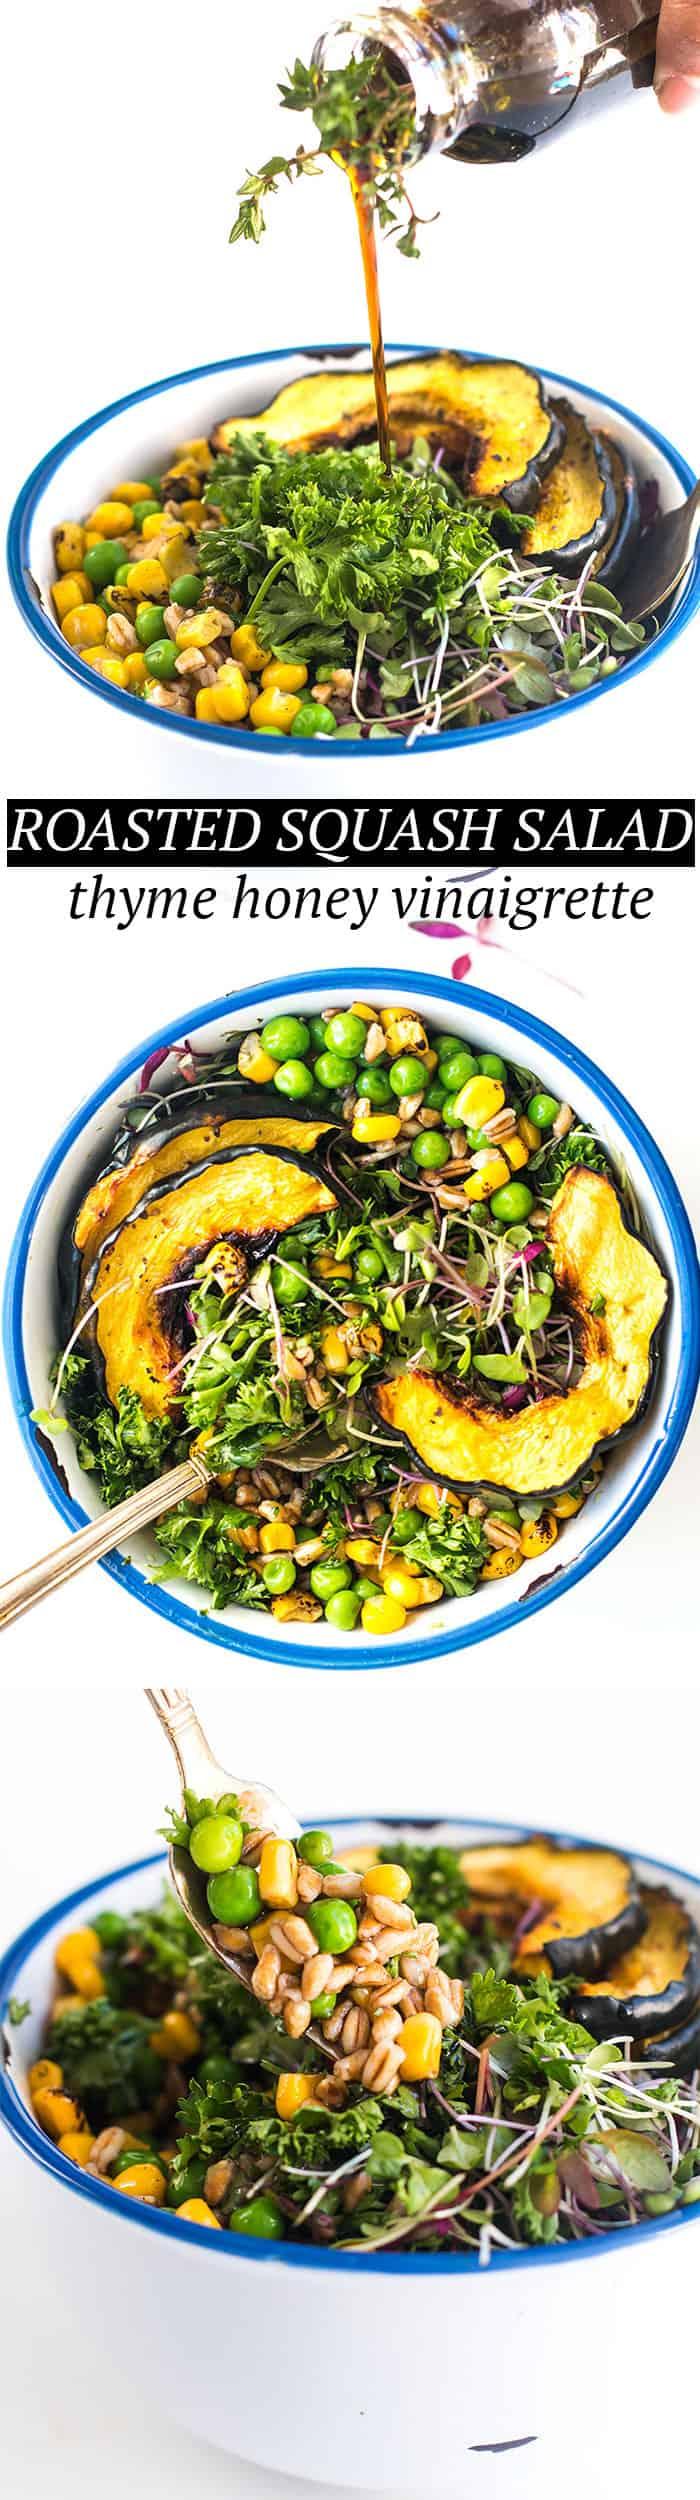 balsamic vinaigrette salad dressing recipe